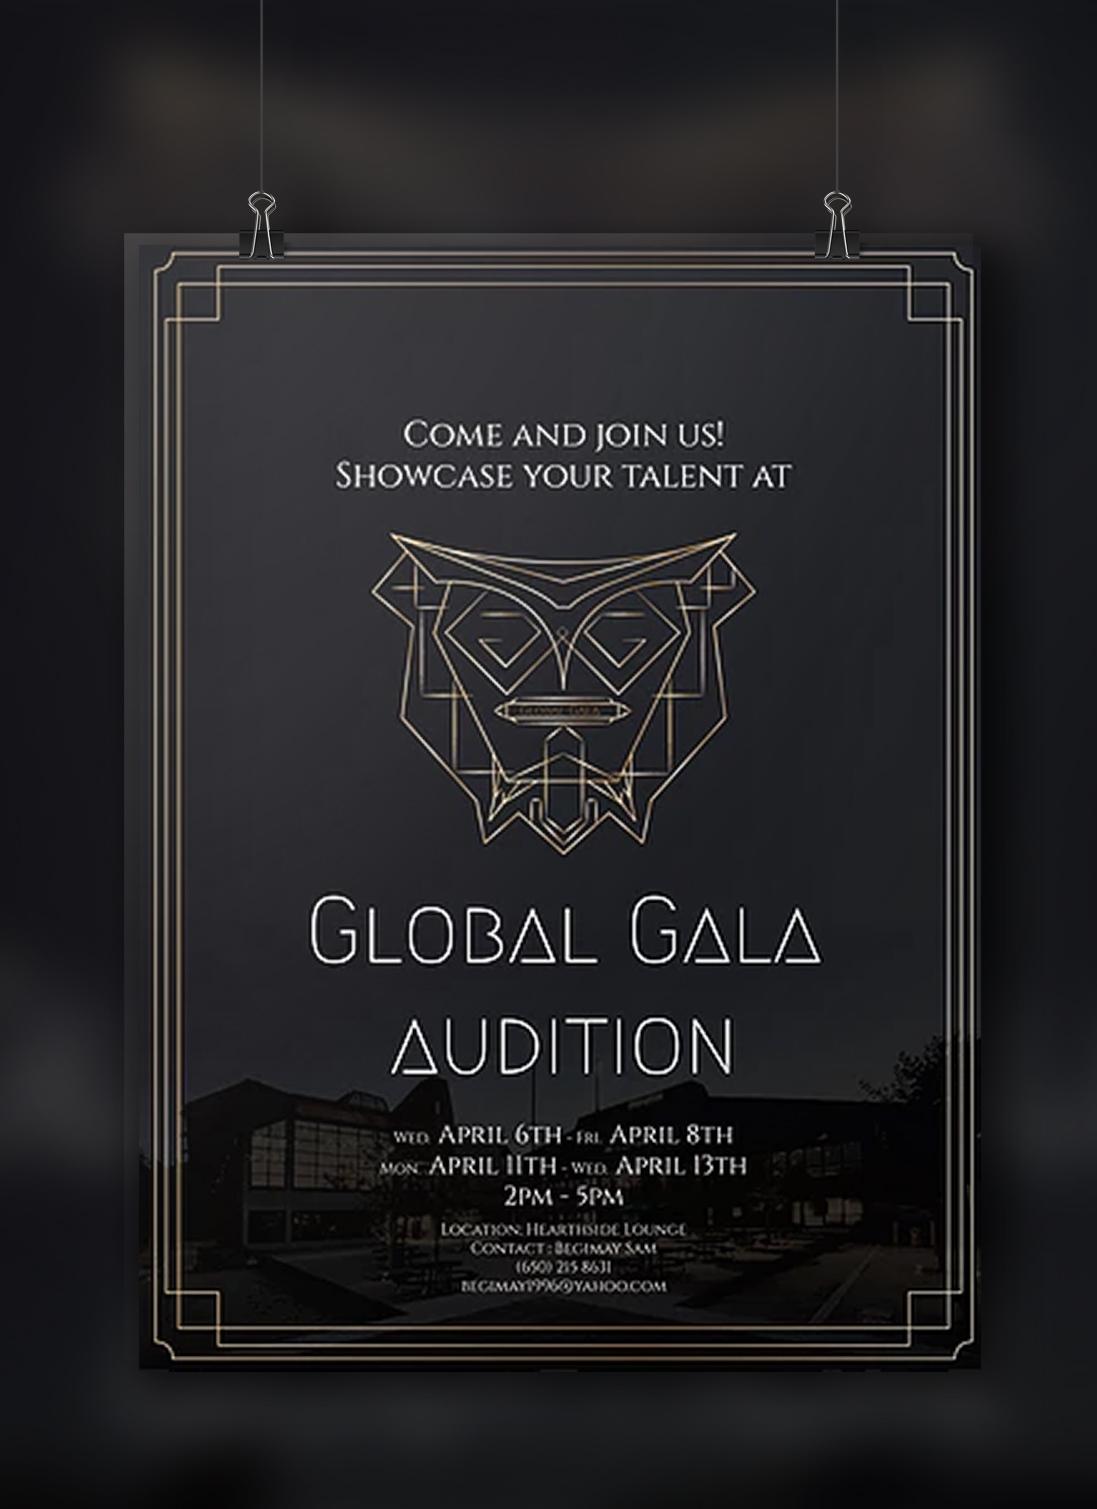 gg presentation poster.jpg